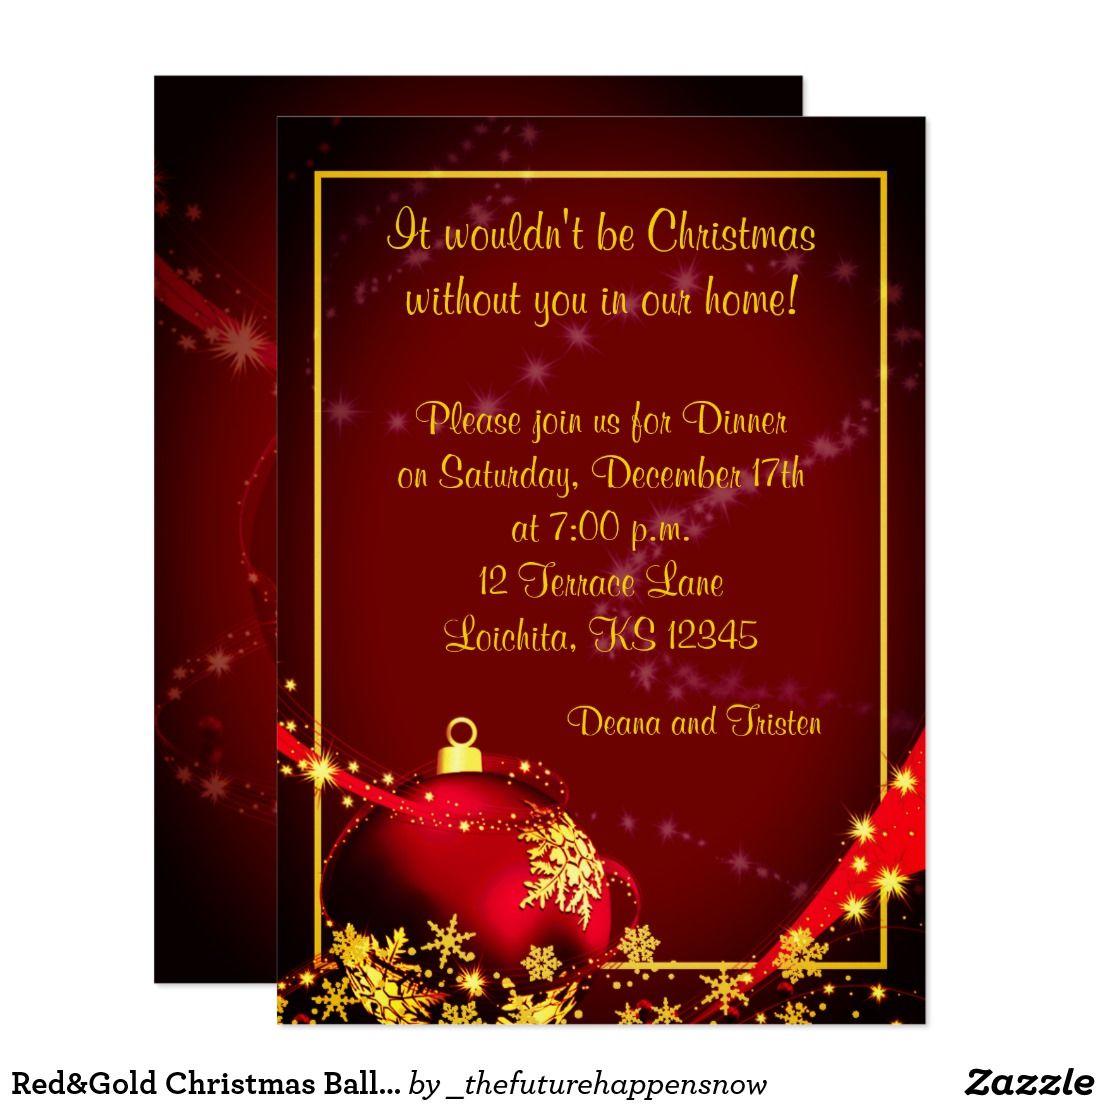 Red&Gold Christmas Ball Dinner Party Invitation | Dinner invitations